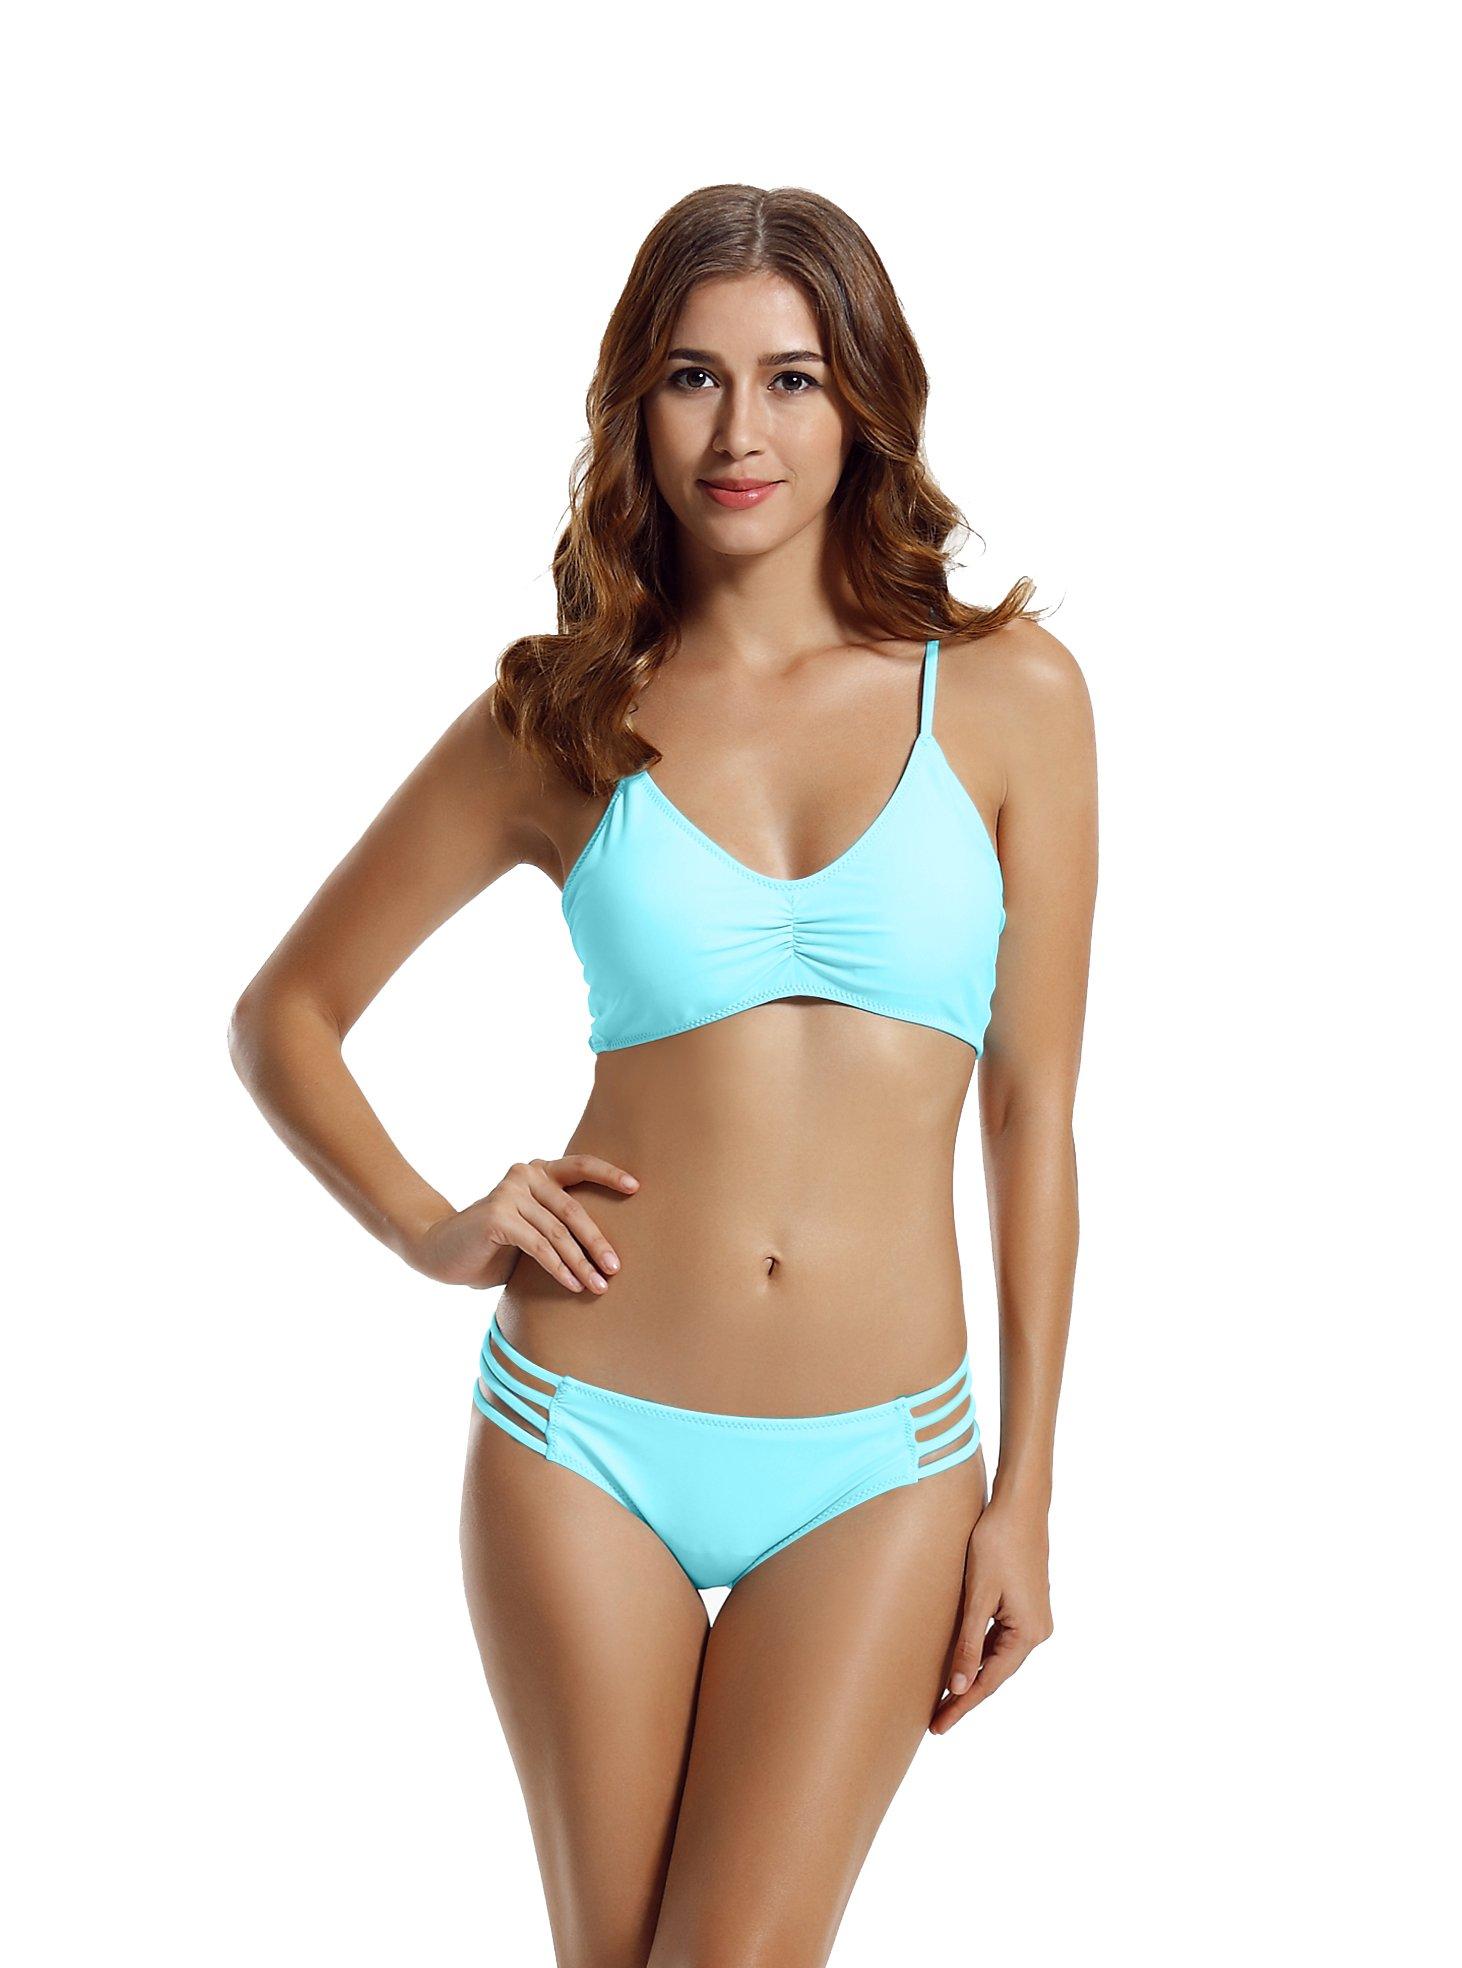 79deb44bb6 zeraca Women s Strap Side Bottom Halter Racerback Bikini Bathing Suits  (FBA) Red product image